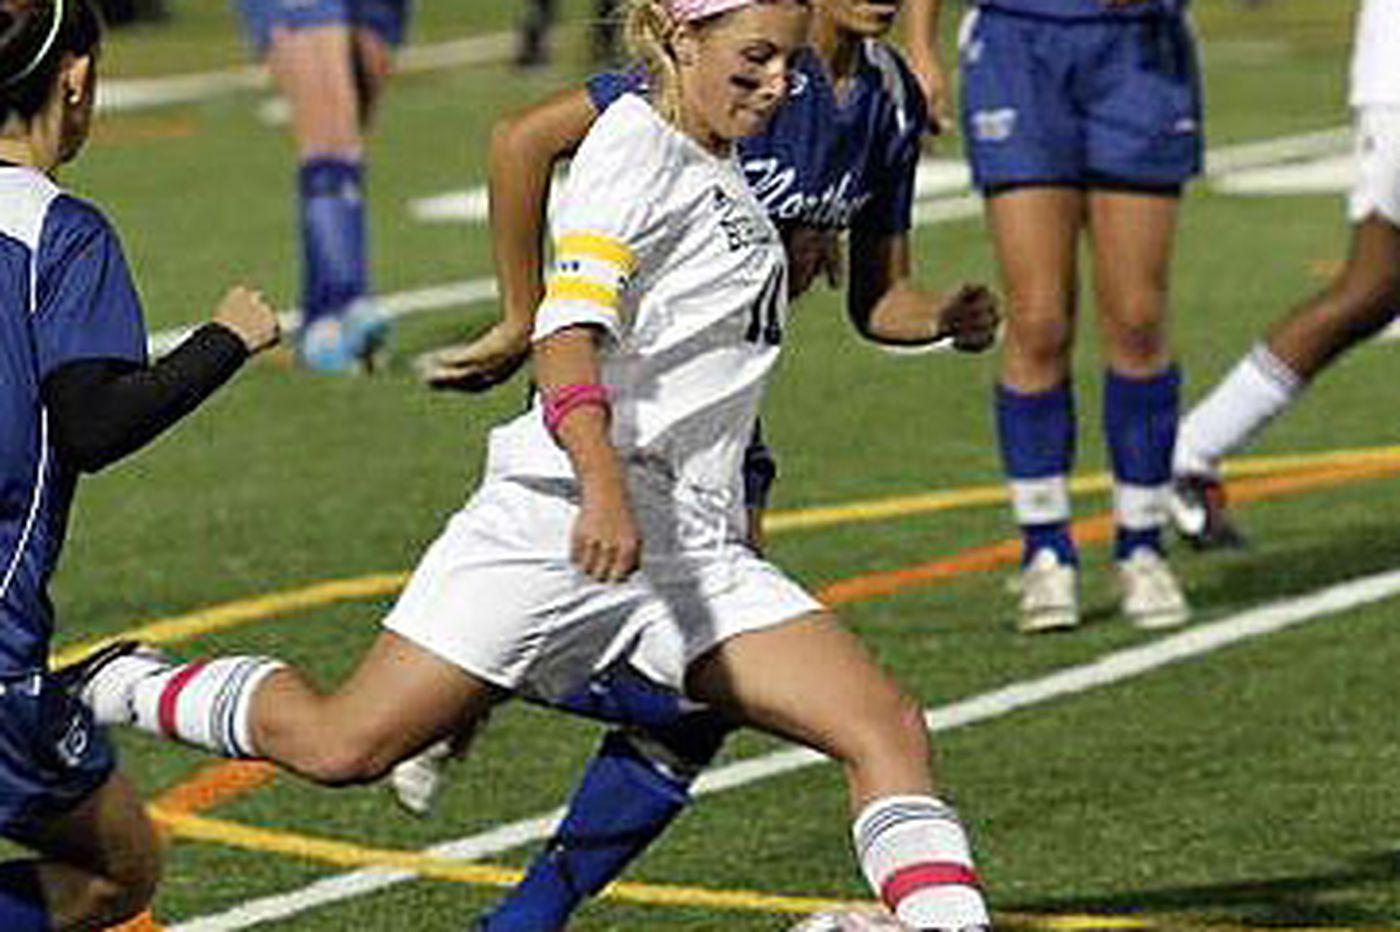 McTamney is top S.J. girls' soccer player